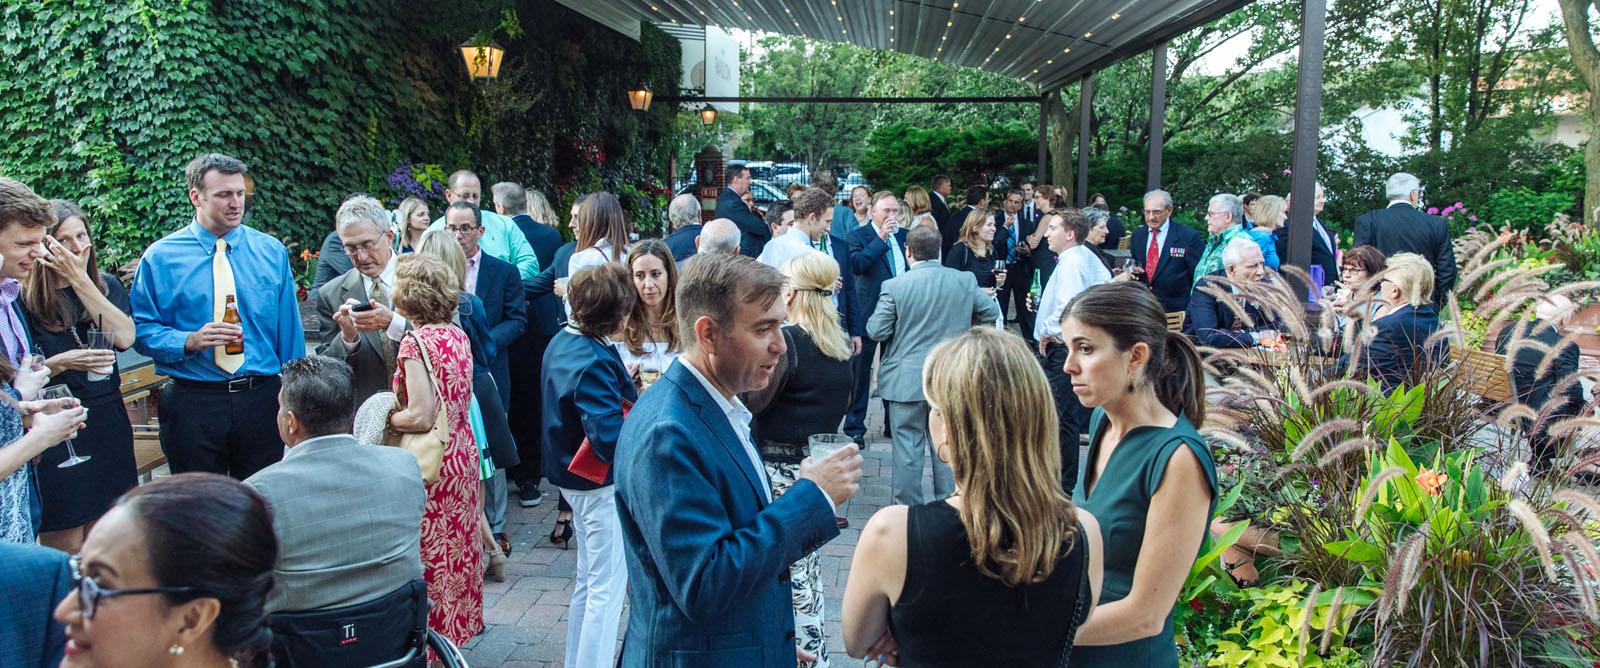 Judd Goldman Adaptive Sailing Foundation Annual Gala in Chicago